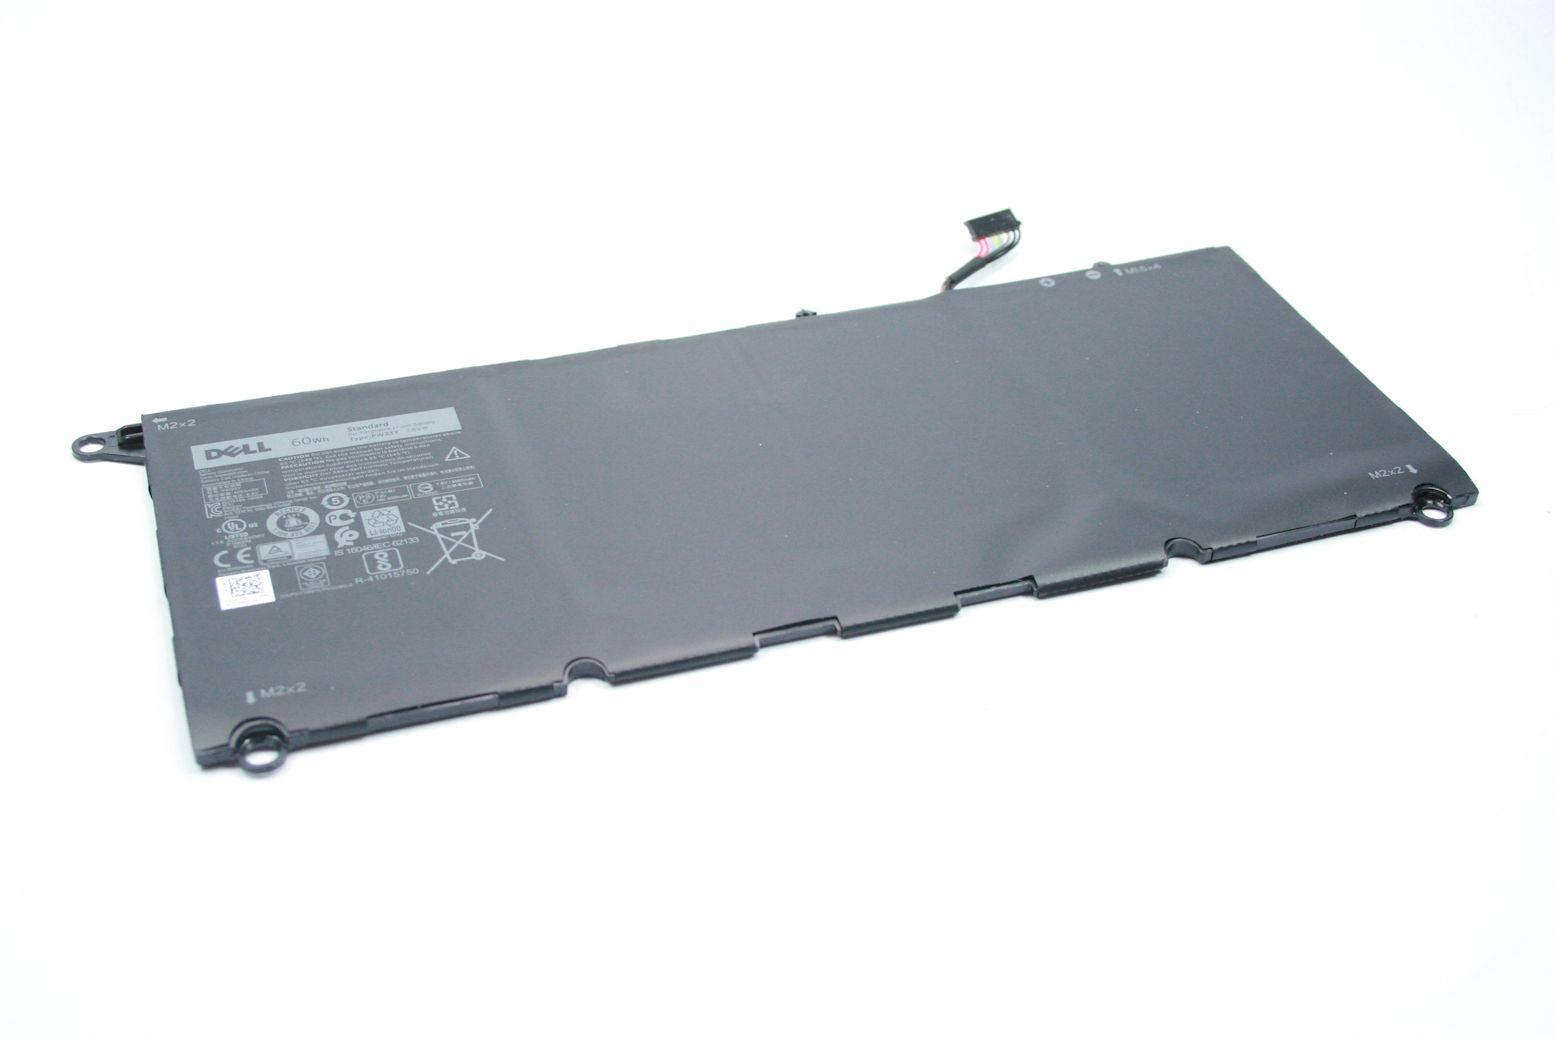 DELL XPS 13 9365 46Wh 4 Zellen Akku Battery Batterie NNF1C